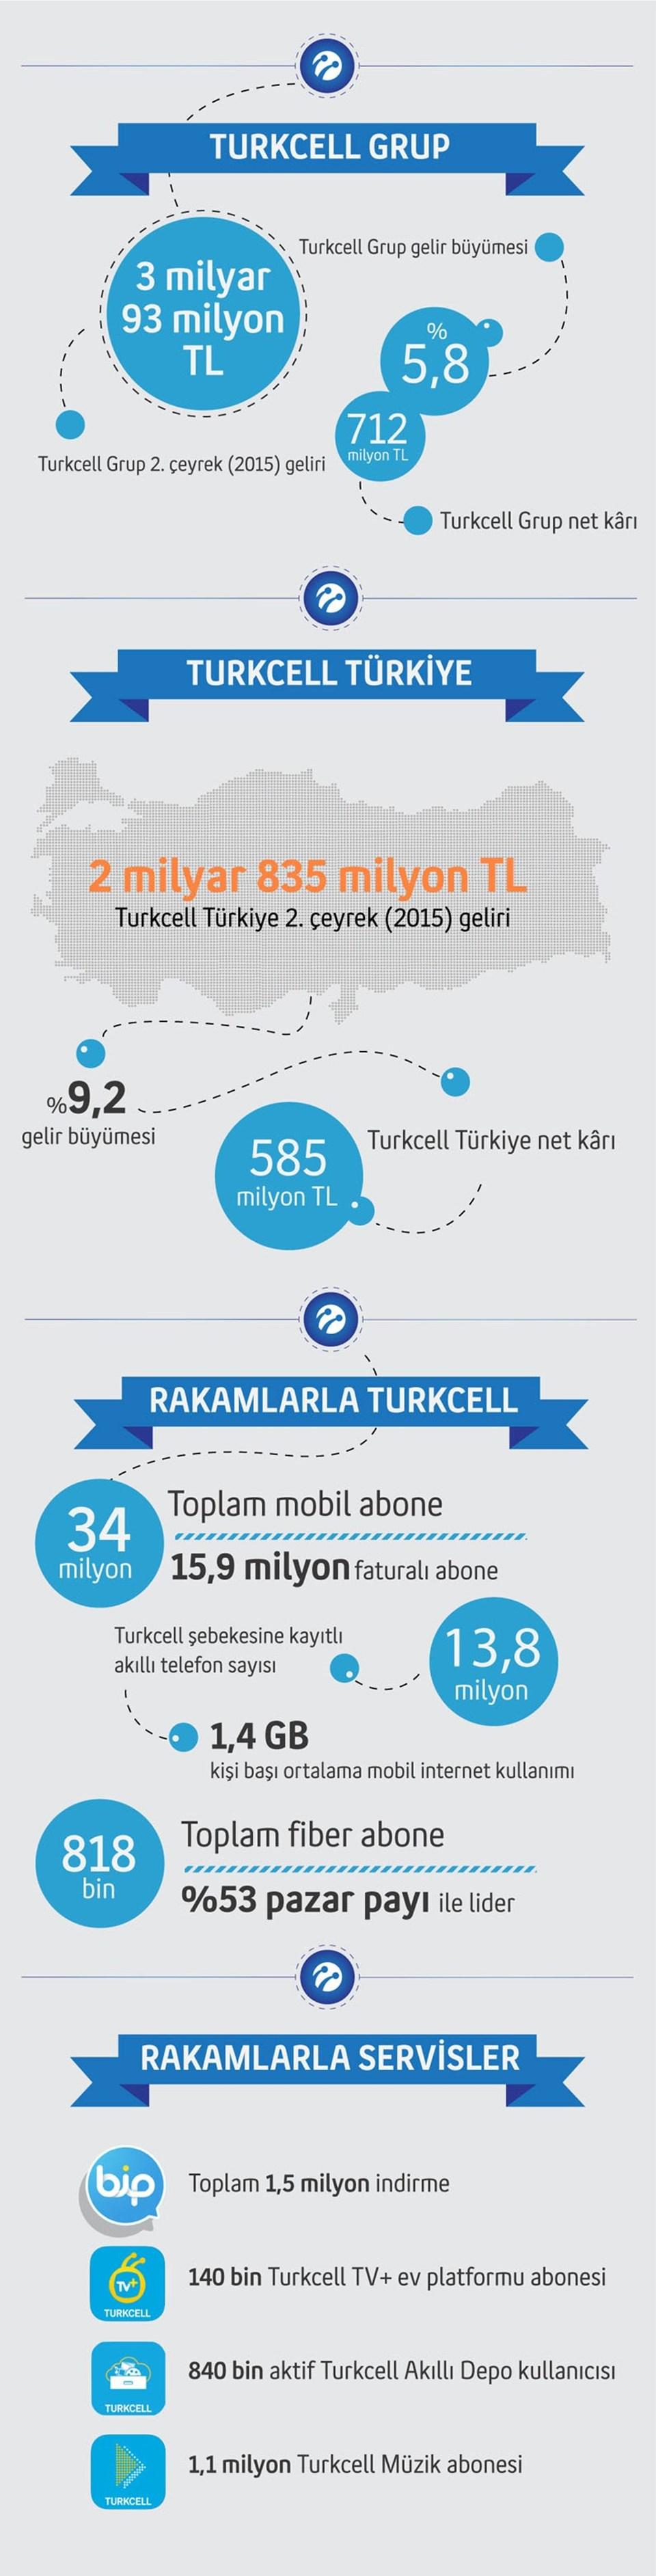 Kaynak: TURKCELL 2015 Q2, finansal sonuçlar, İstanbul (30.07.2015)